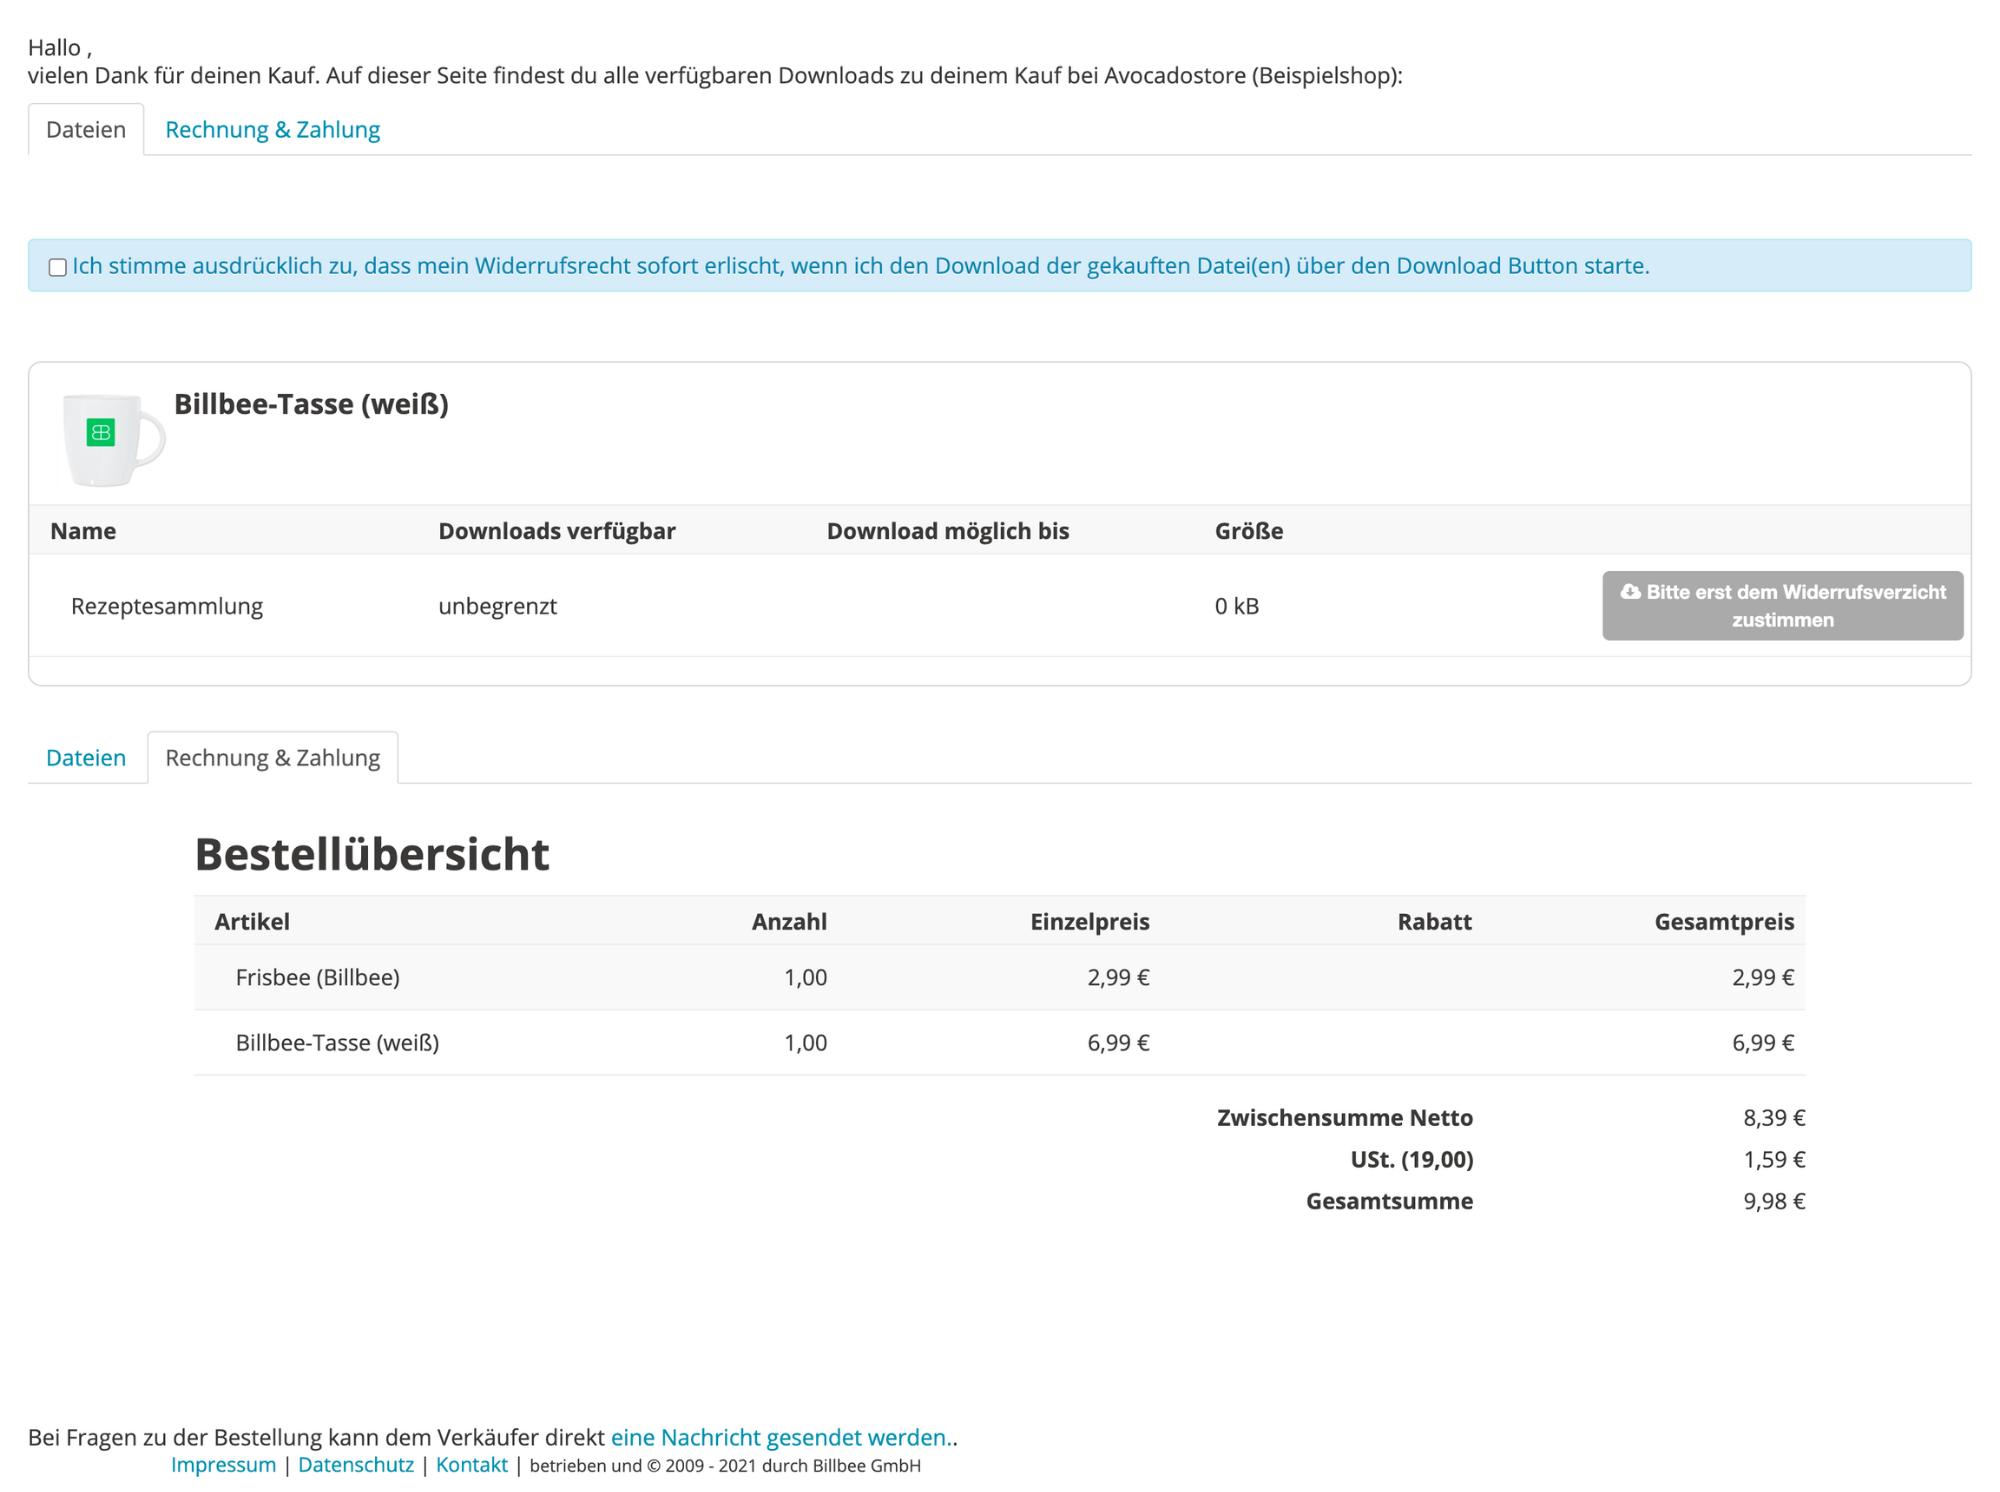 Screenshot auf dem Billbee-Kundenportal